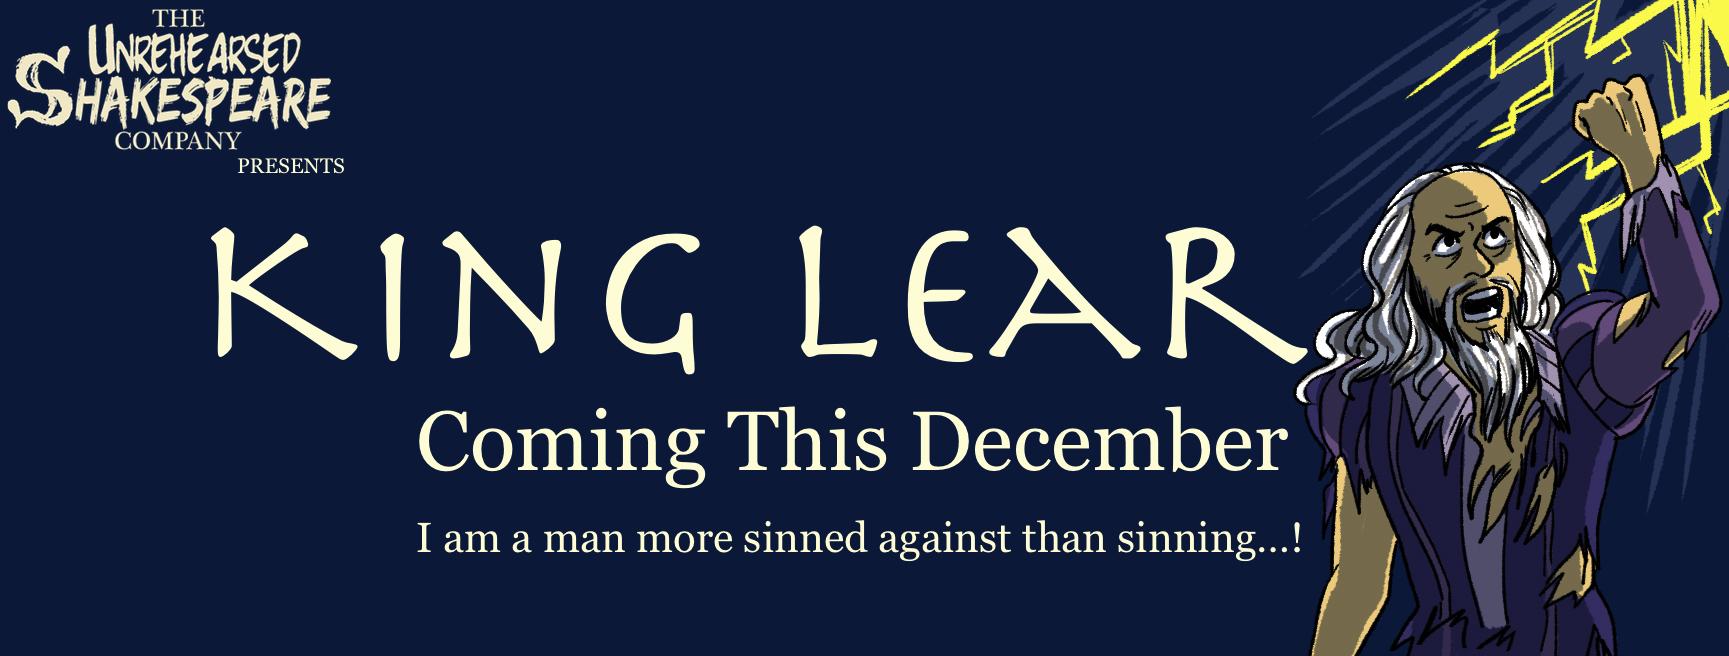 lear-banner-copy